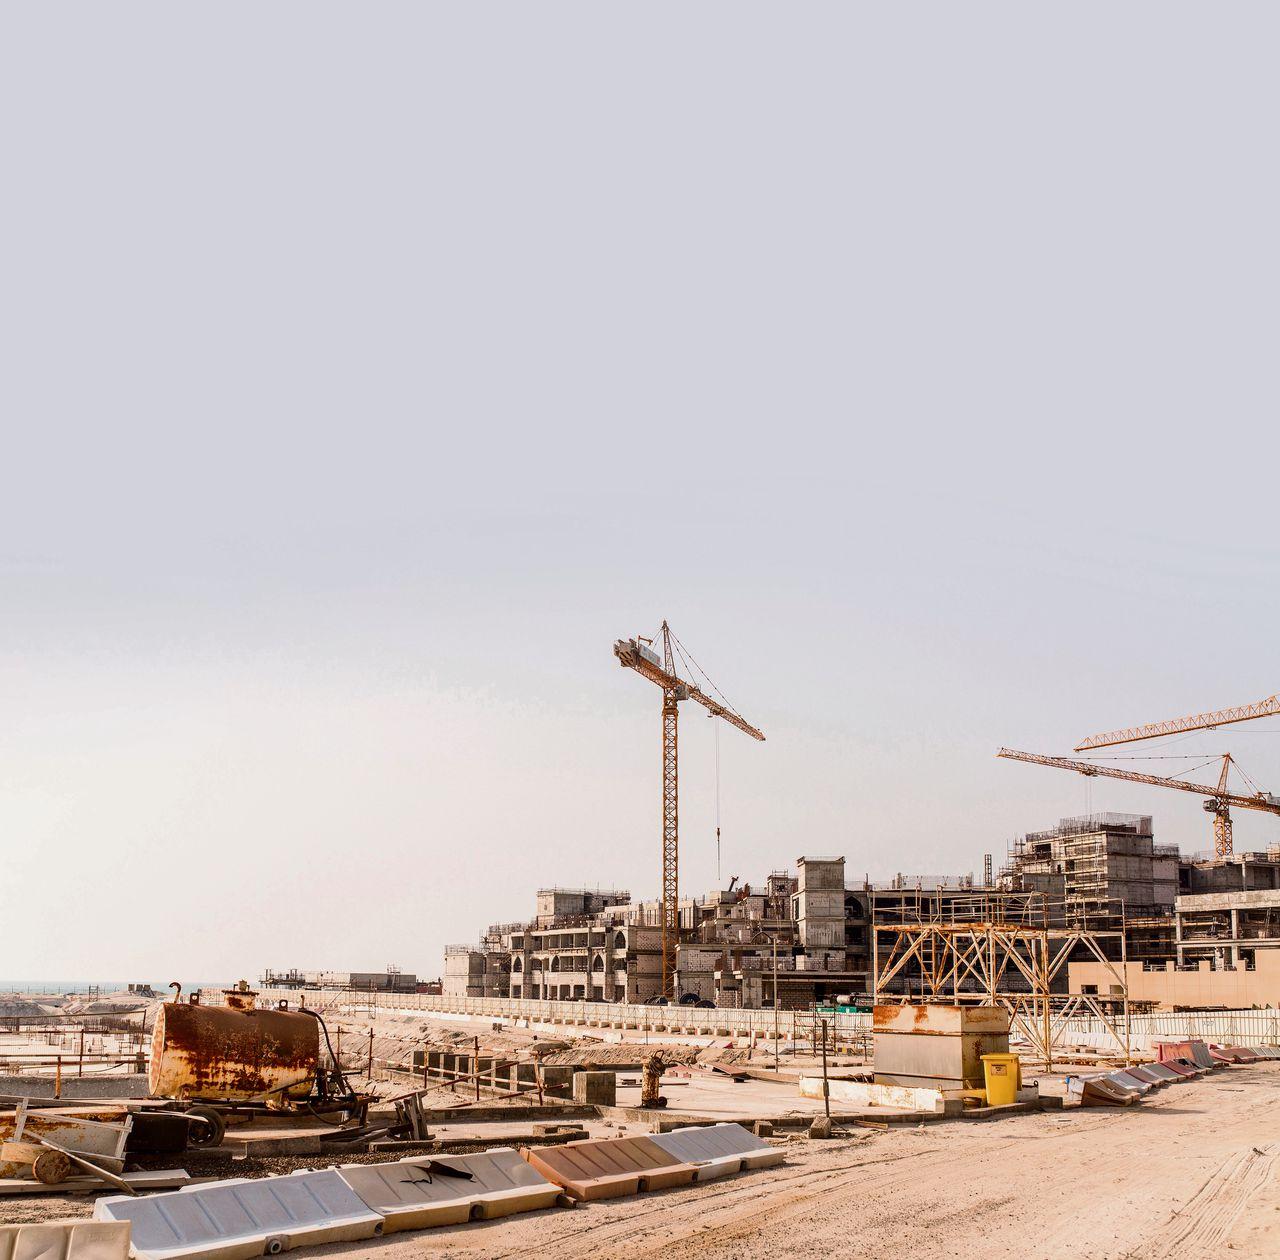 Een bouwplaats in Abu Dhabi